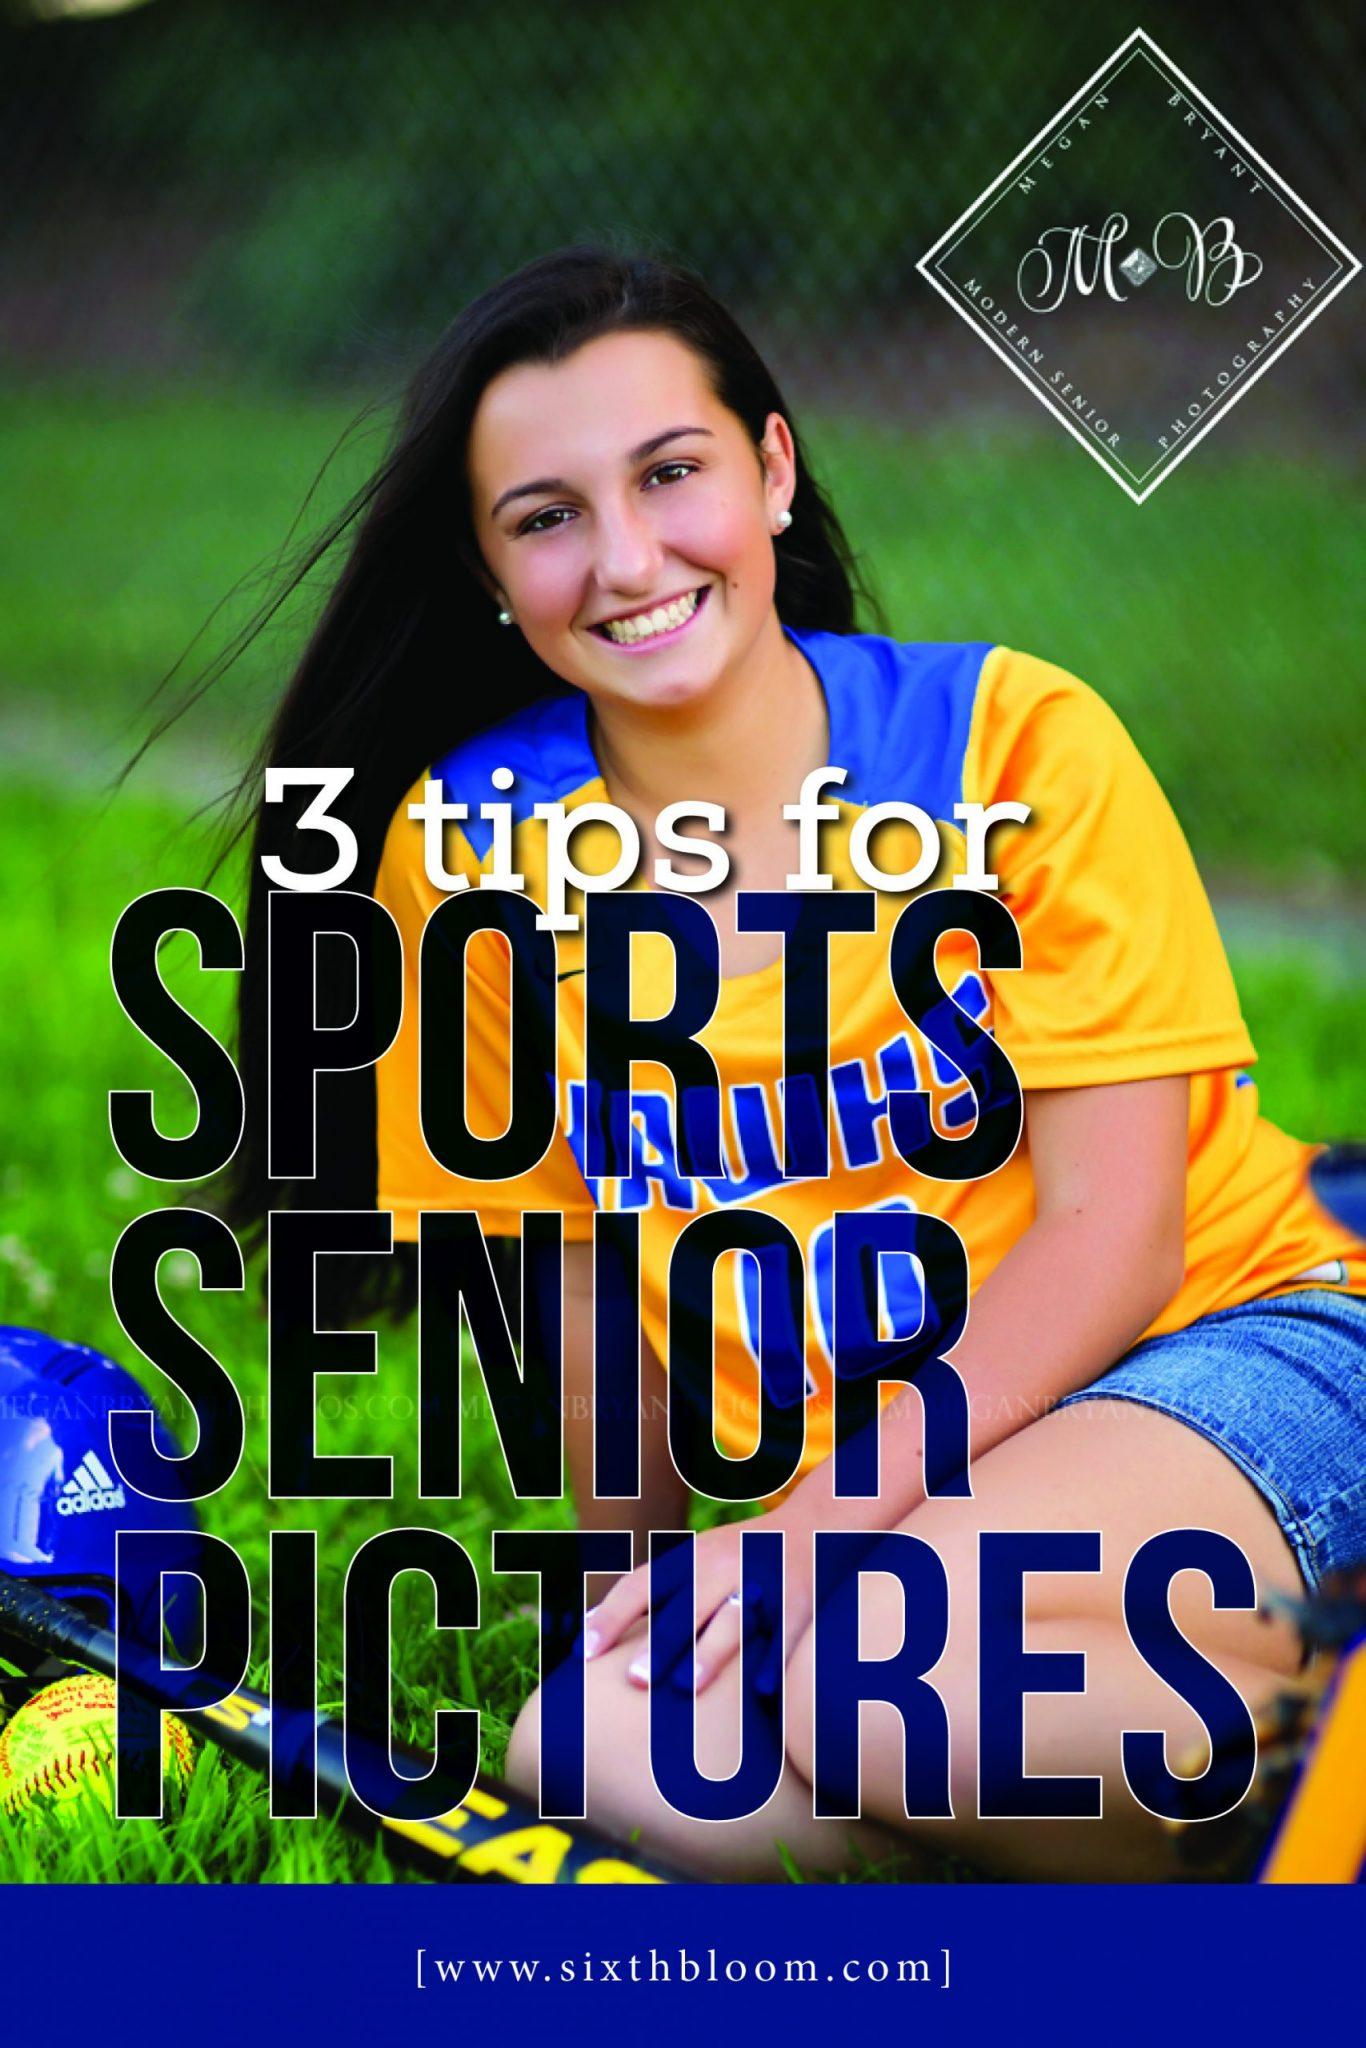 senior girl in sports attire taking high school pictures